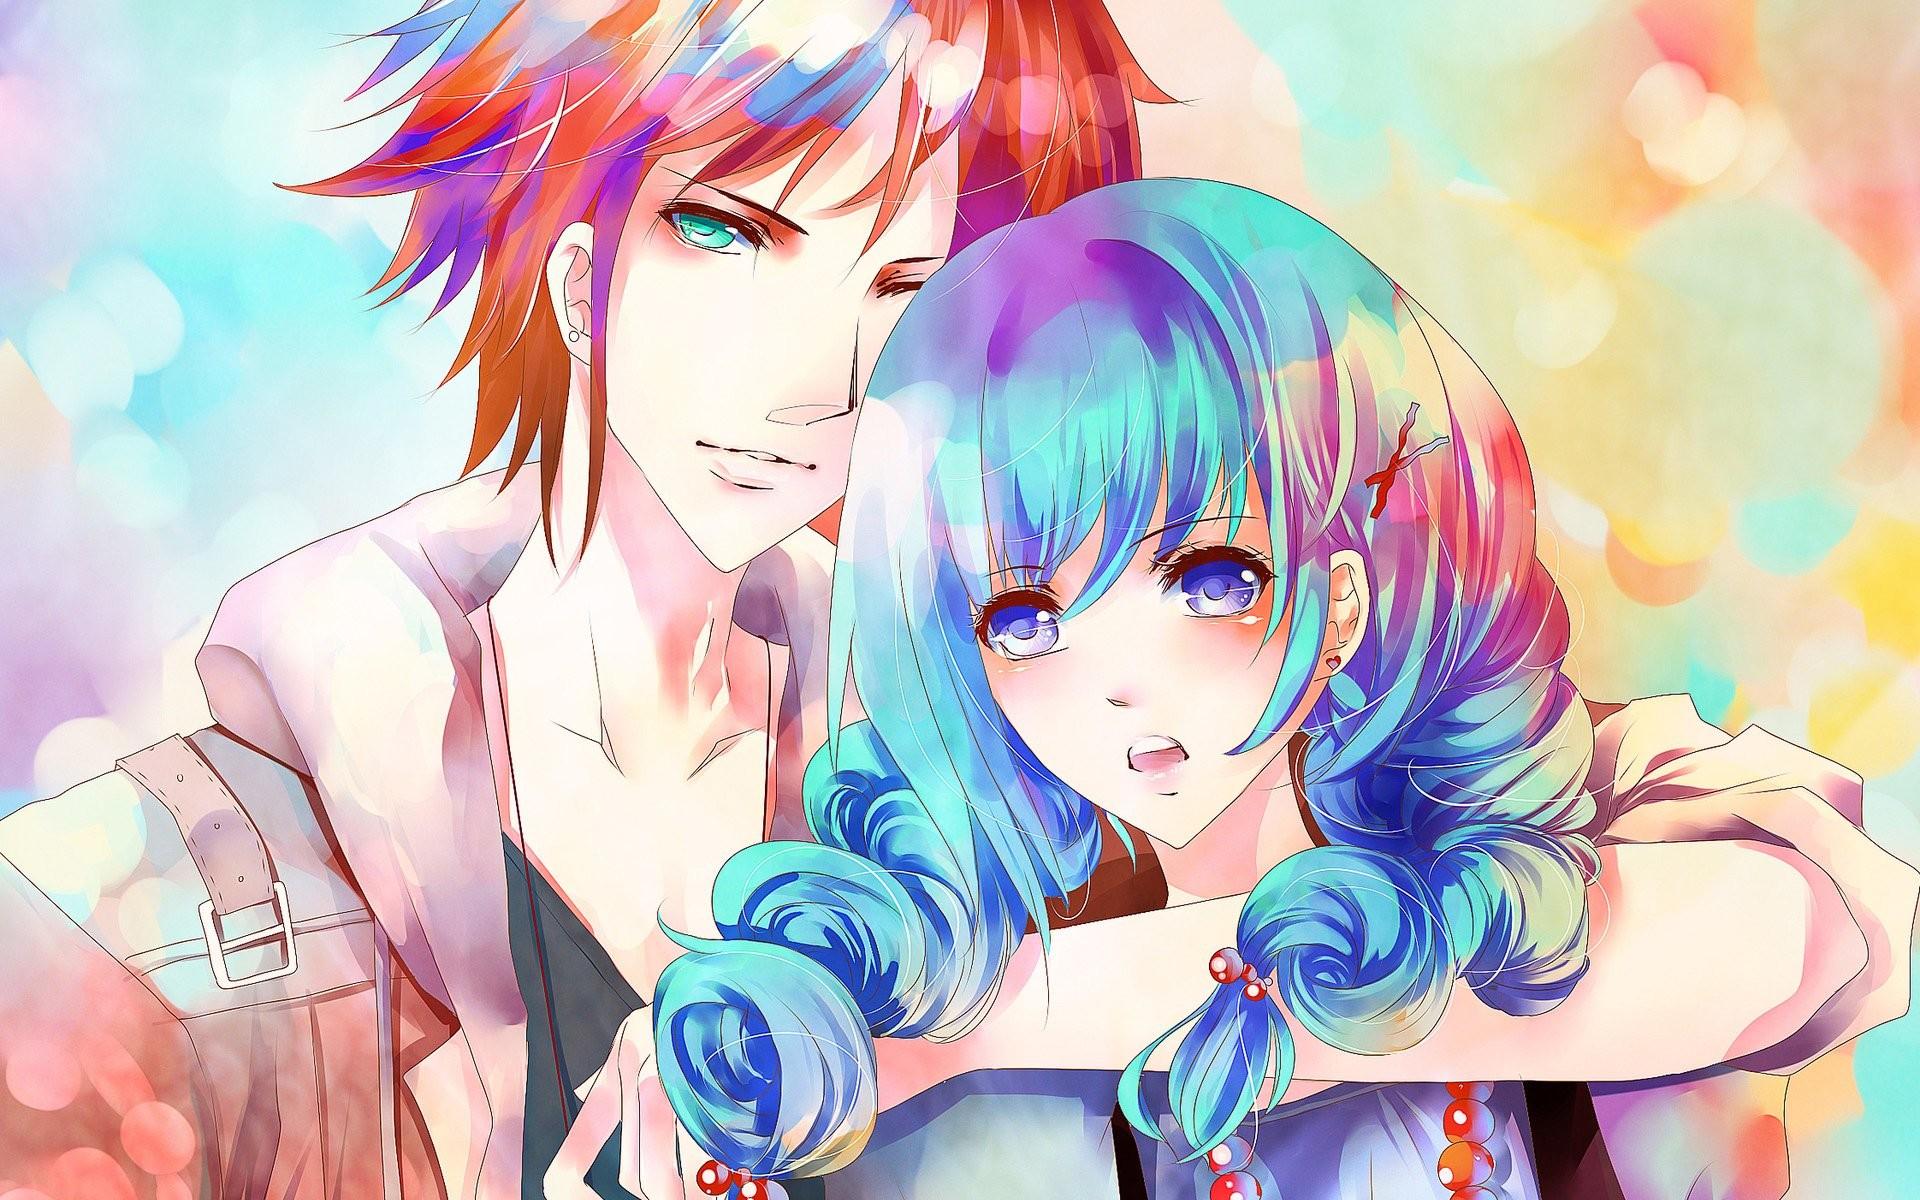 Romantic Anime Wallpapers Wallpaper 1920×1200 Anime Couple Wallpaper (52  Wallpapers) | Adorable